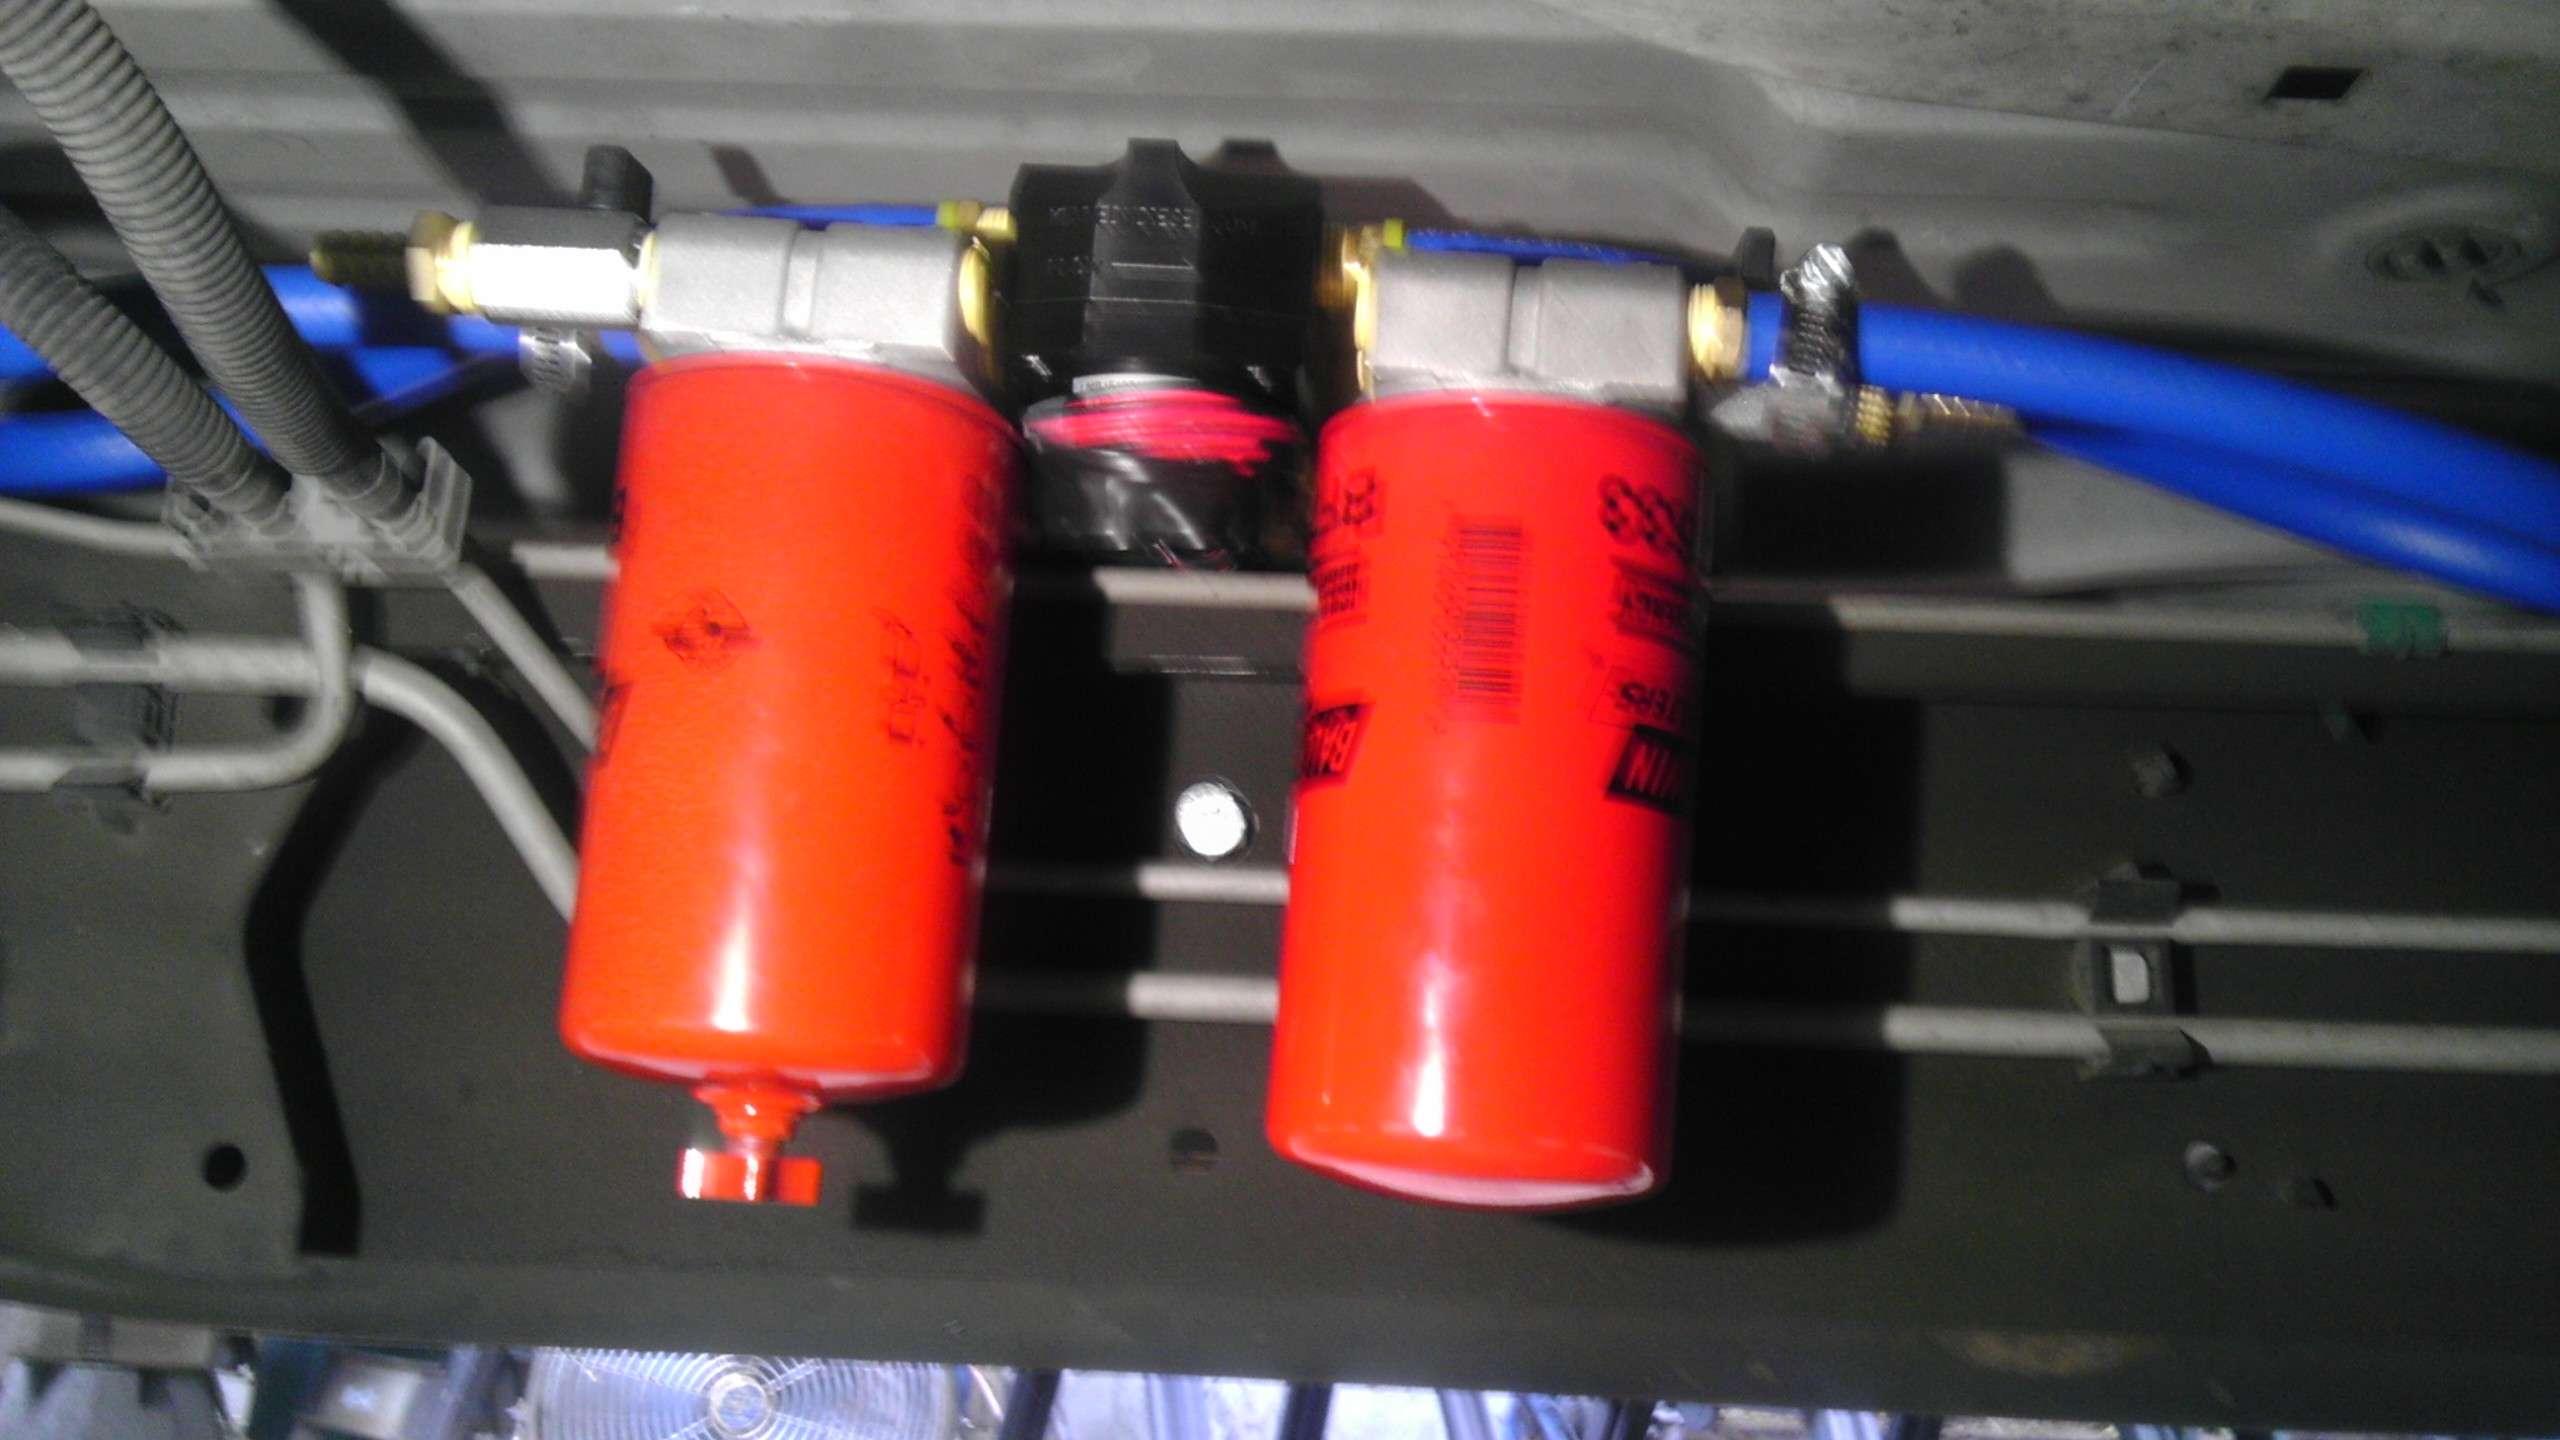 Diesel Fuel Filter Heater Wrap Ivoiregion Duramax My Lift Pump Kit Chevy And Gmc Forum